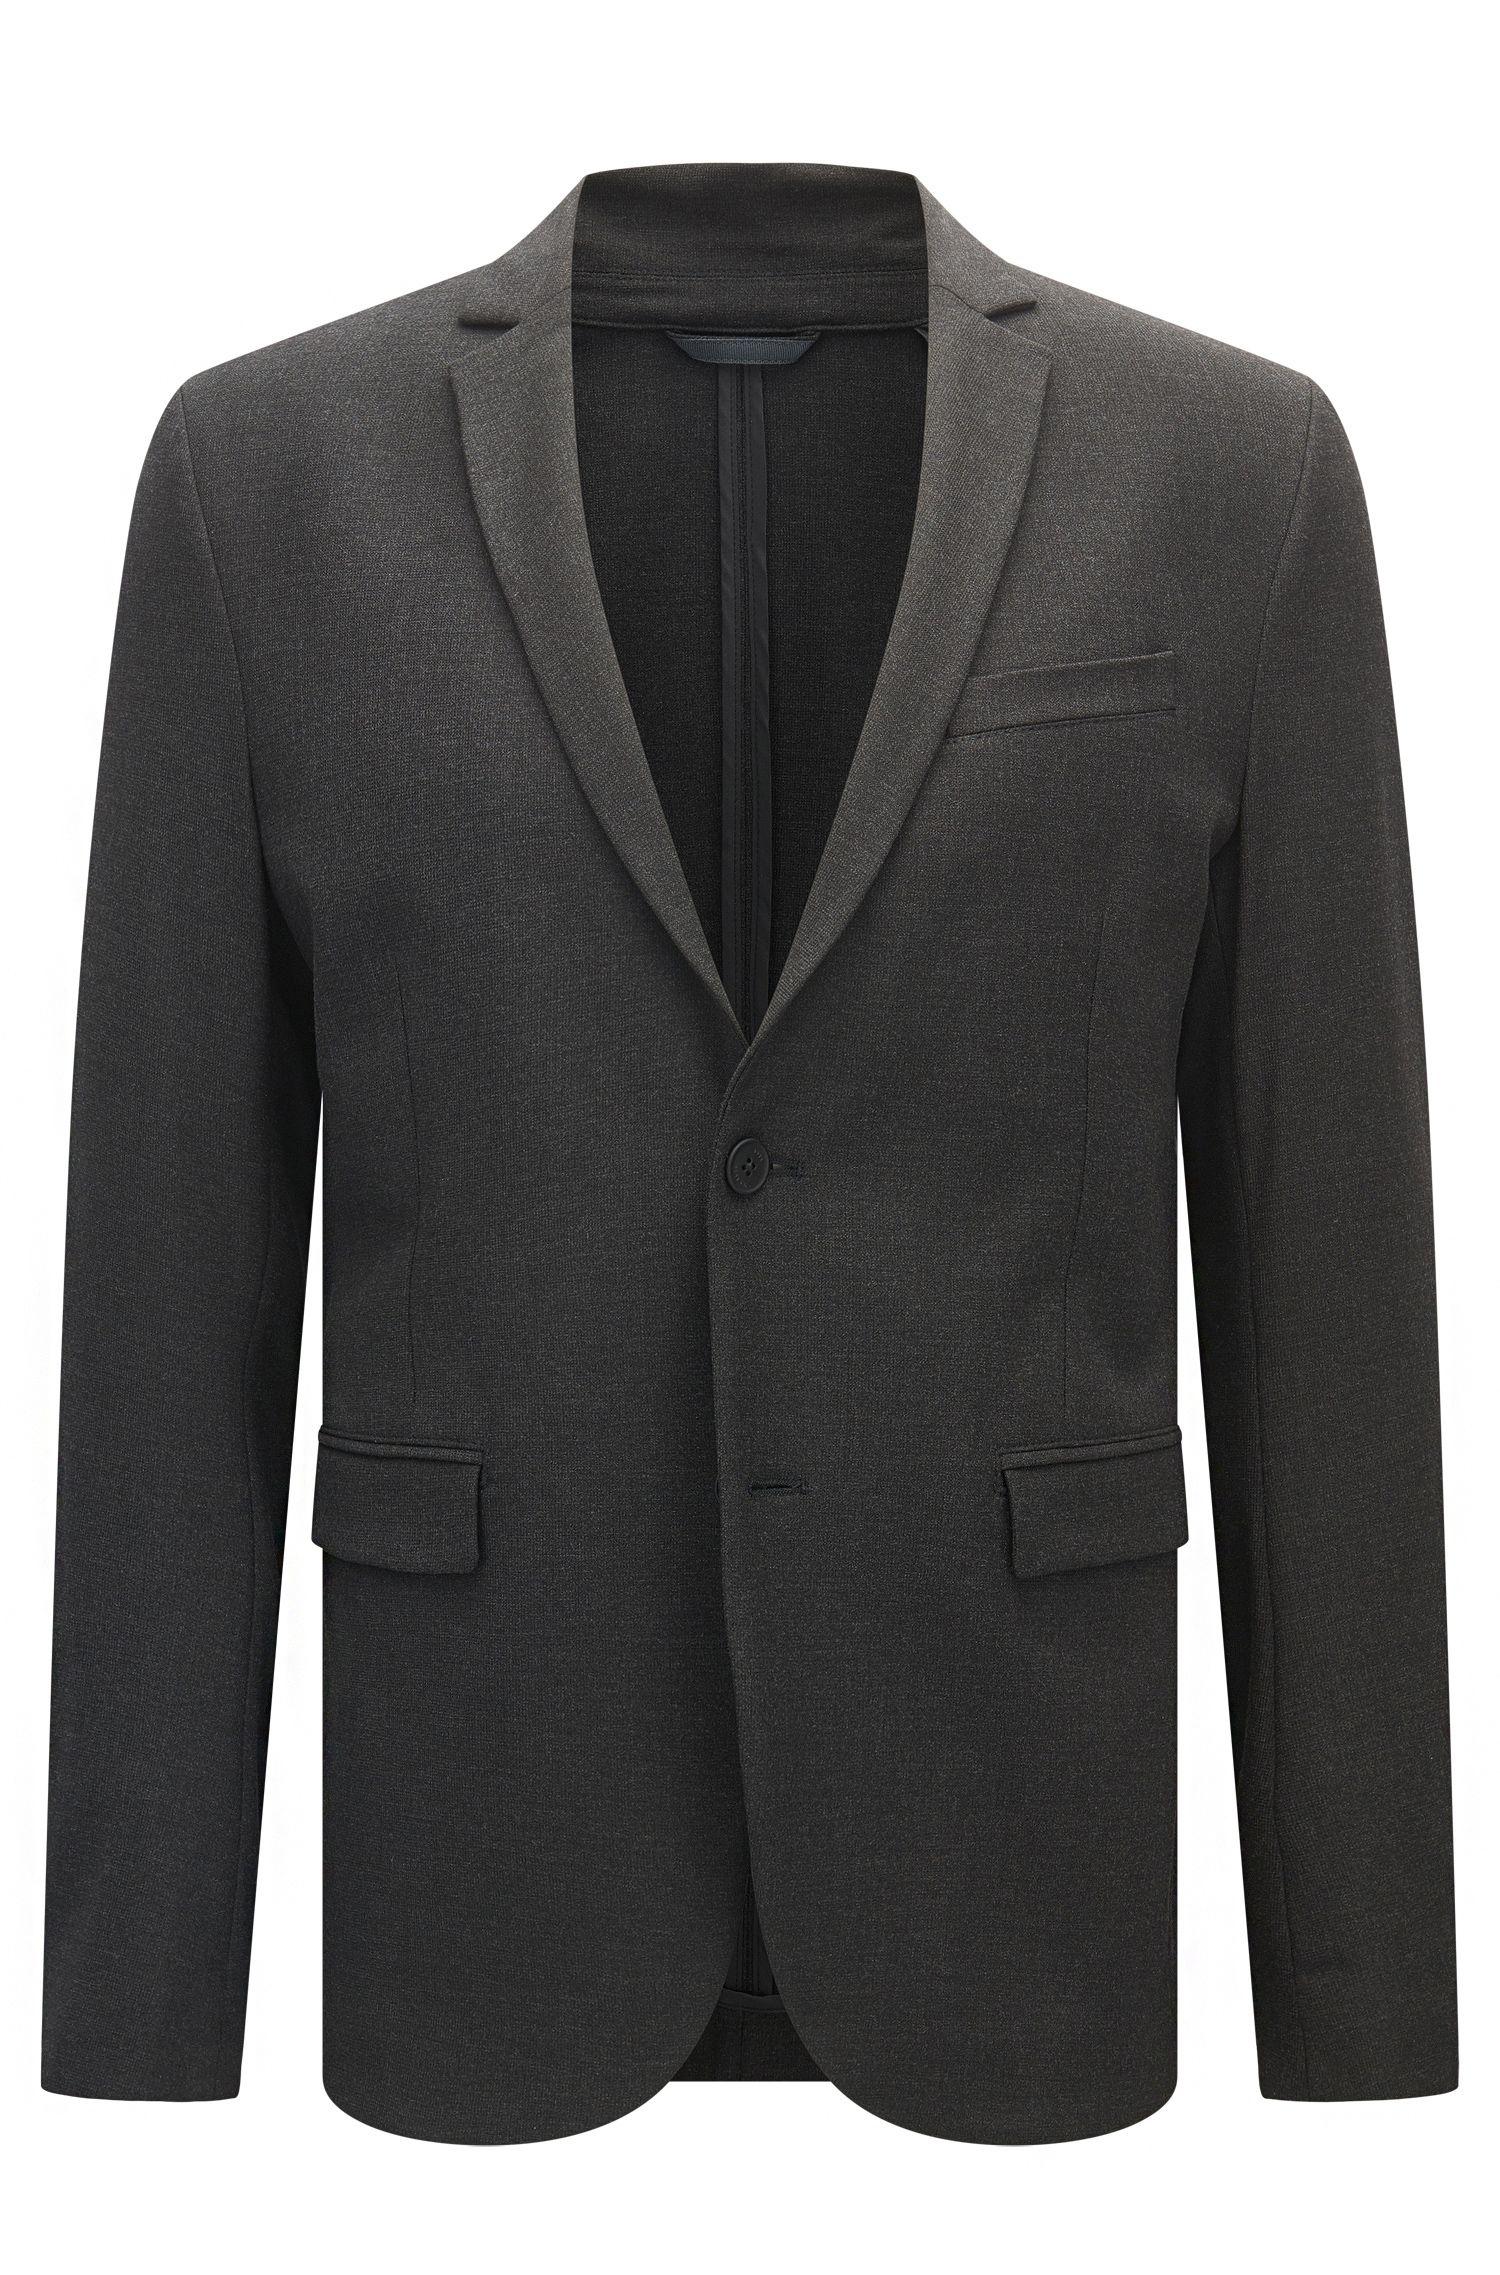 'Amono' | Slim Fit, Stretch Sport Coat